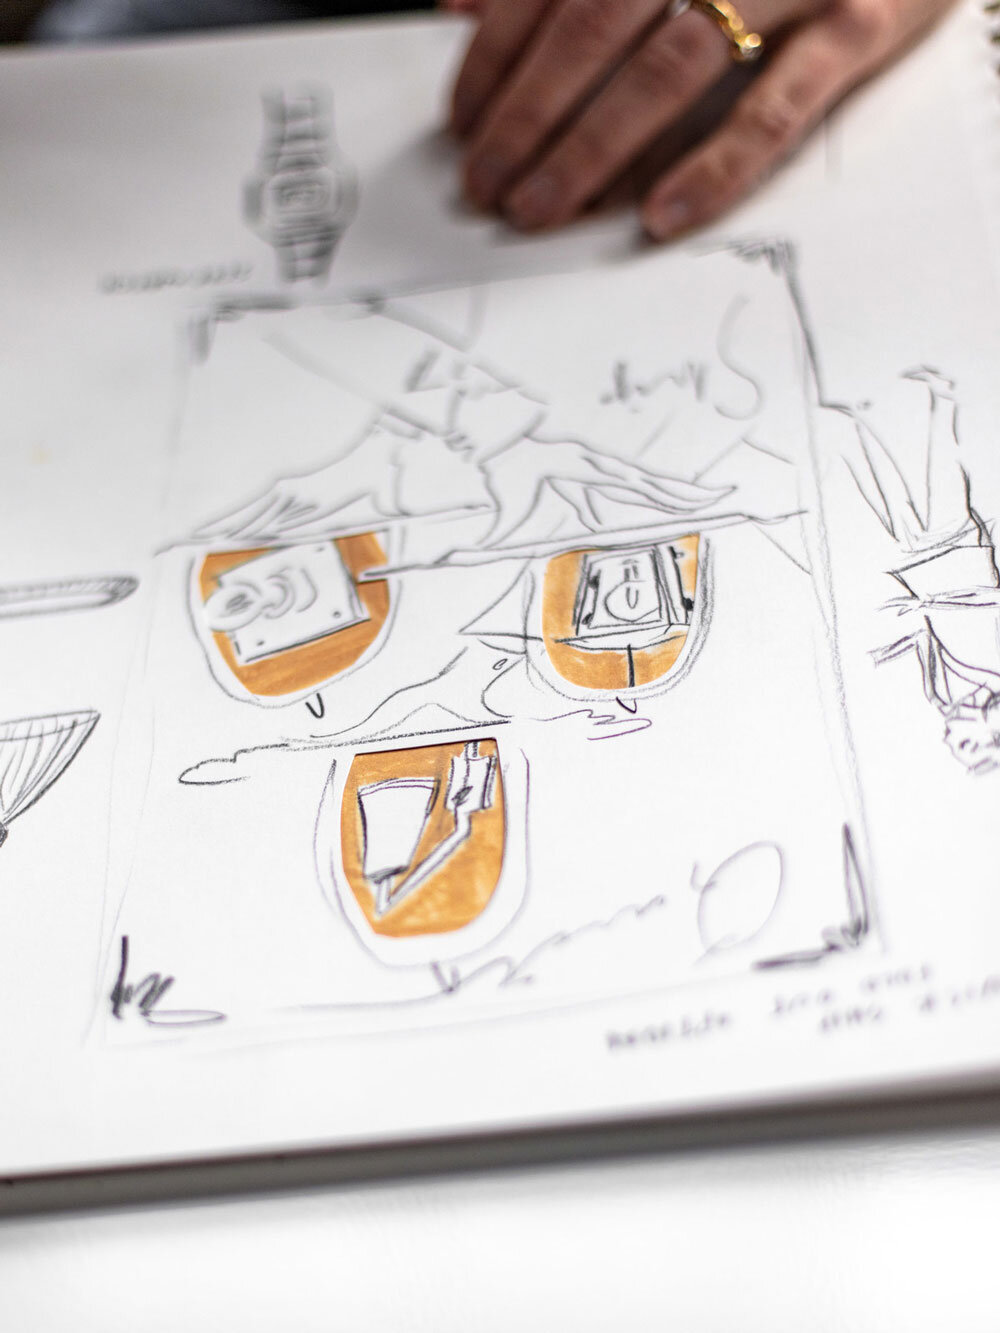 carlisle-burch-sketch.jpg